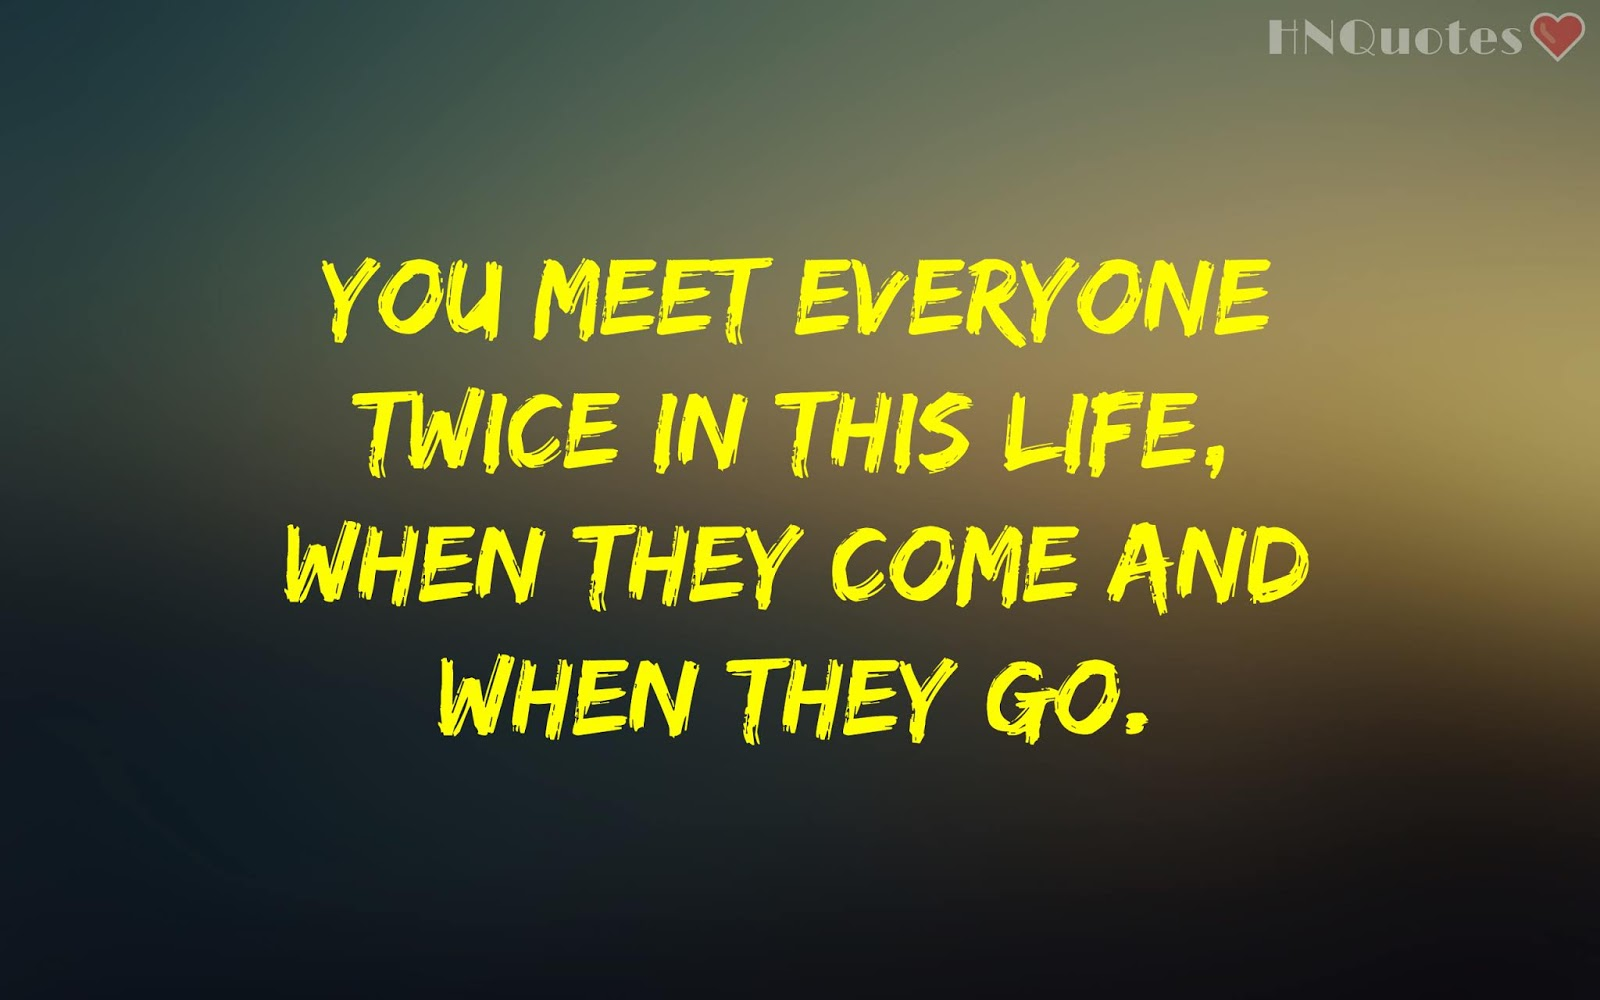 [Sad]-Quotes-on-Life-29-[HNQuotes]